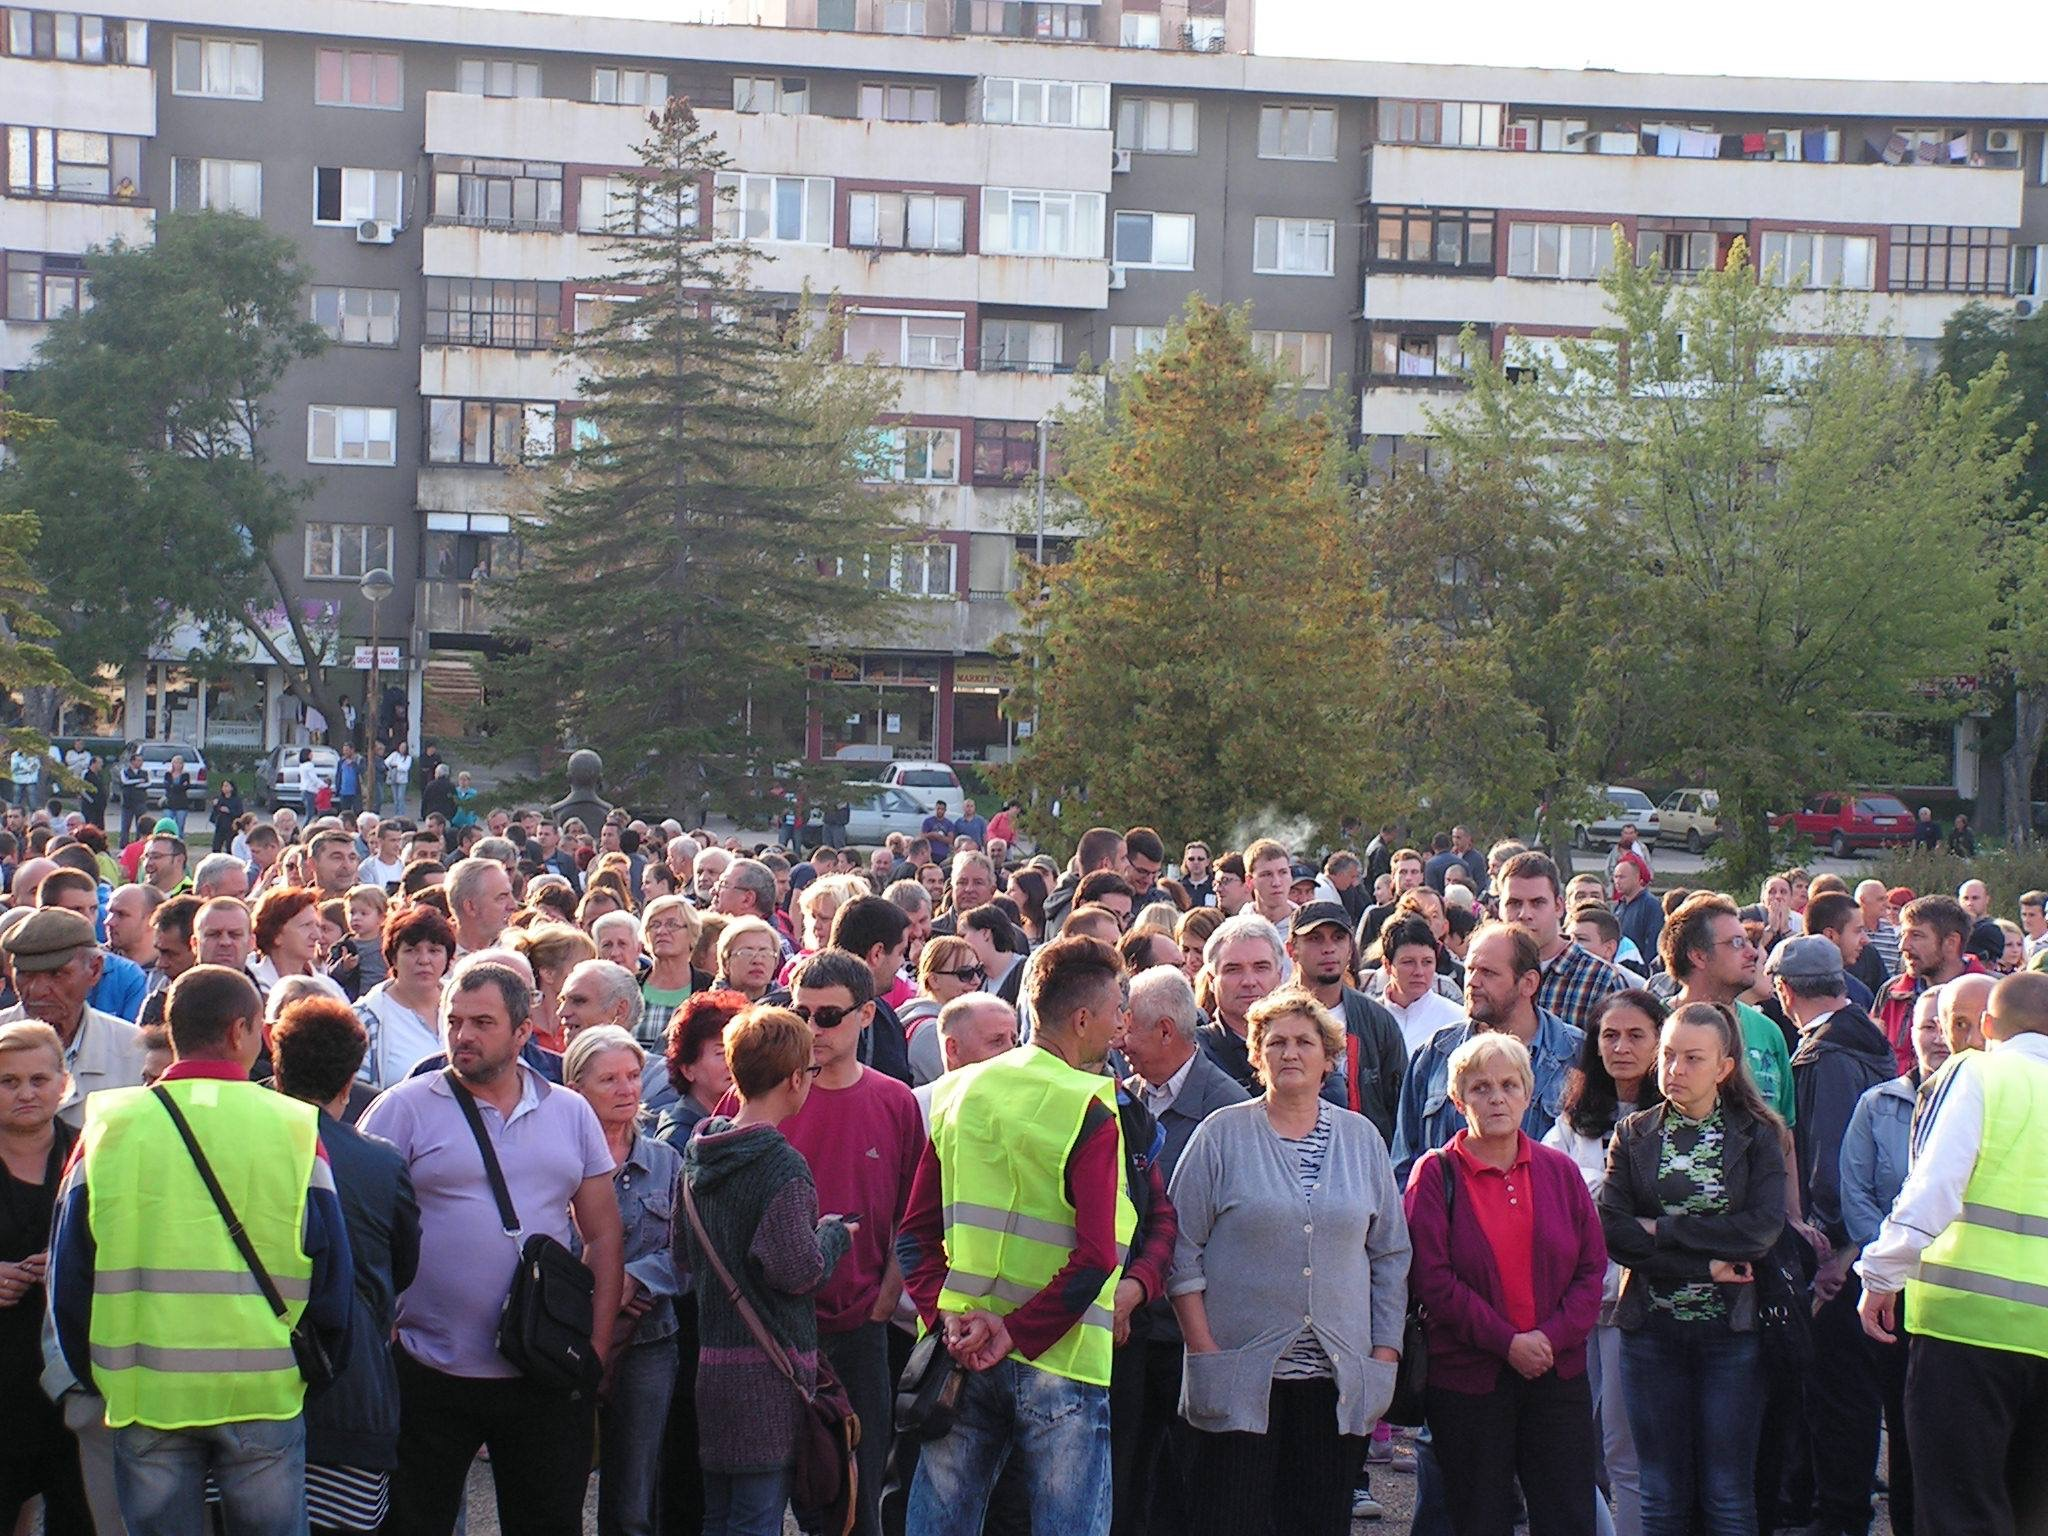 Građani se digli protiv zagađenja Bora. Arhiva: http://www.mc.kcbor.net/2015/10/03/2-ekoloski-protest-6-oktobar/